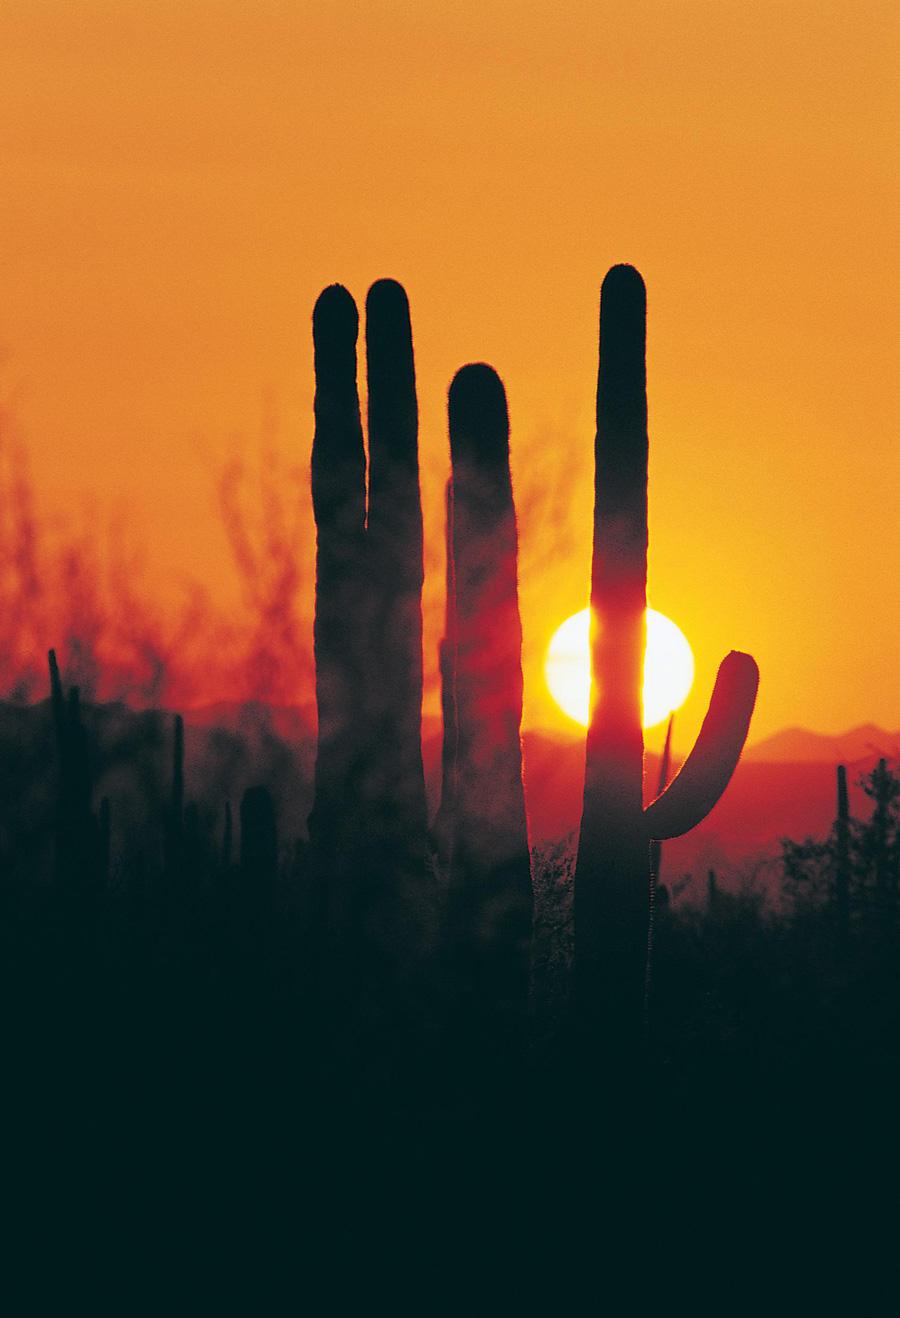 Saguaro silhouettes